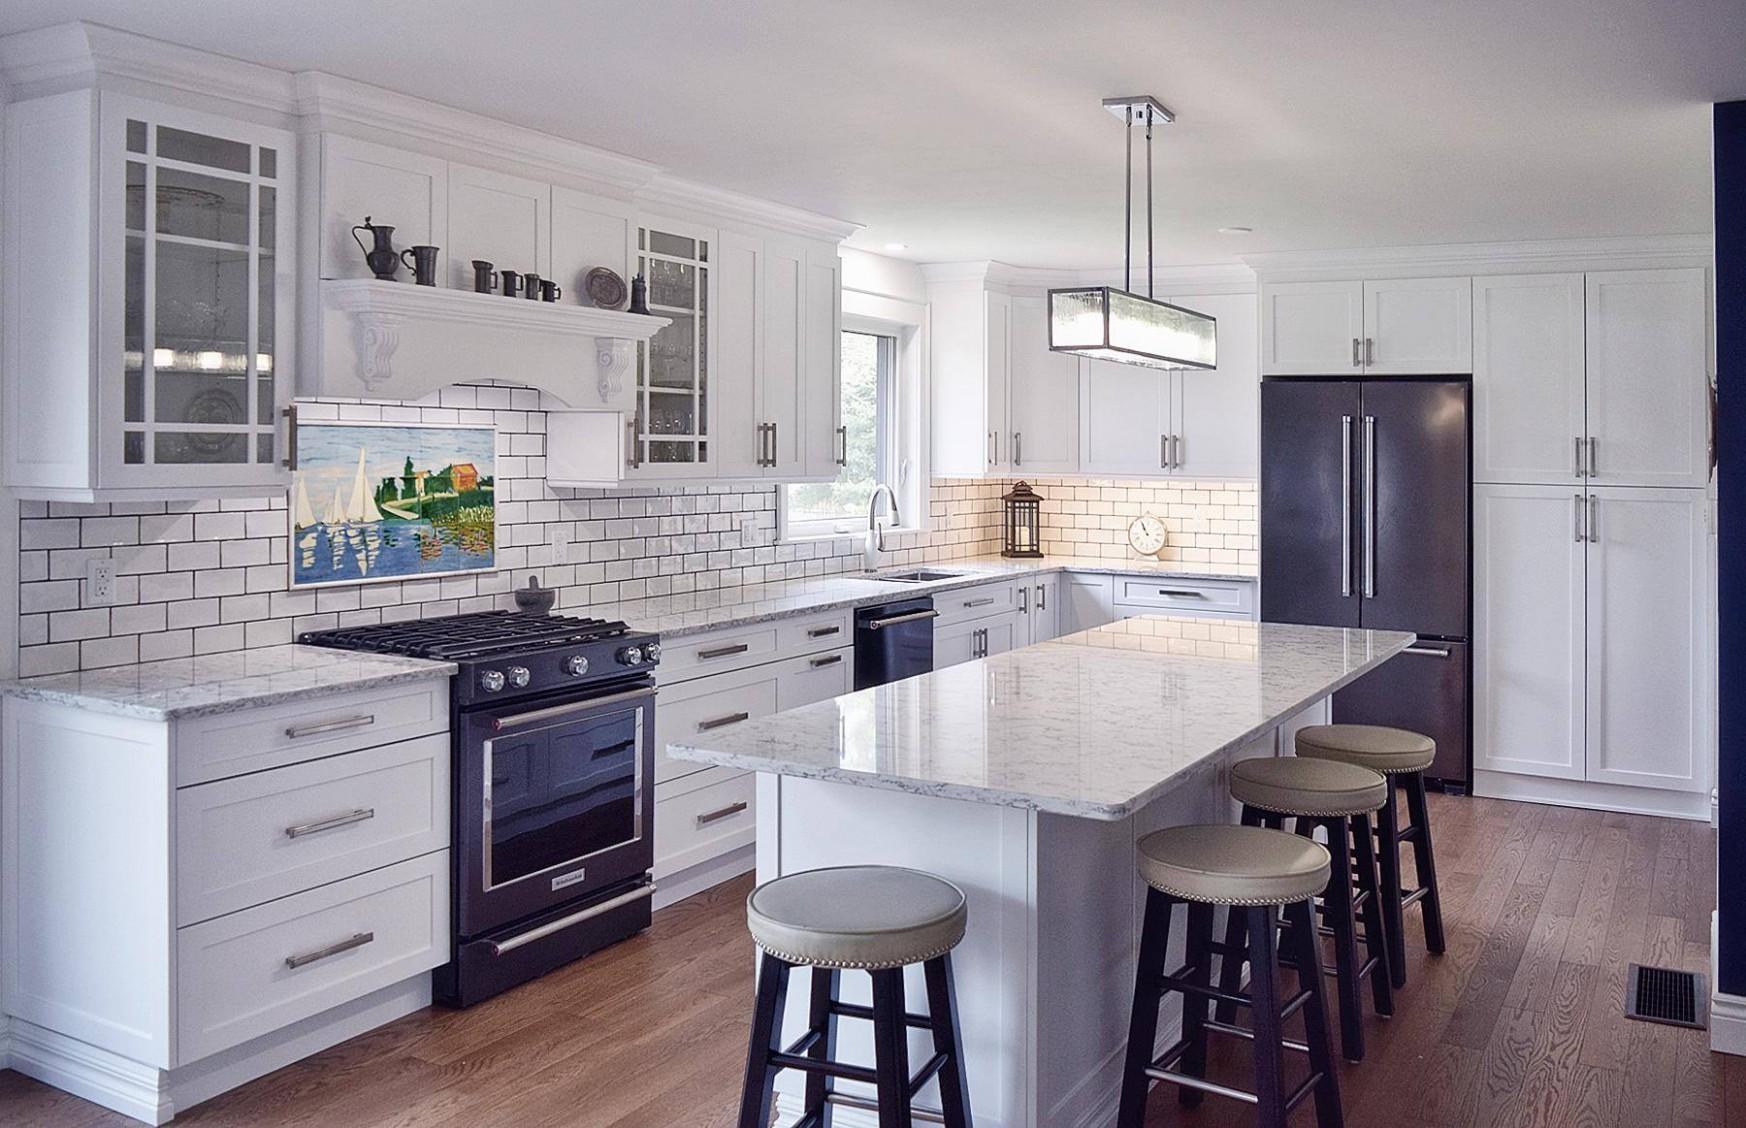 Kitchen cabinets design ideas - White Kitchen Cabinets And Quartz Countertops